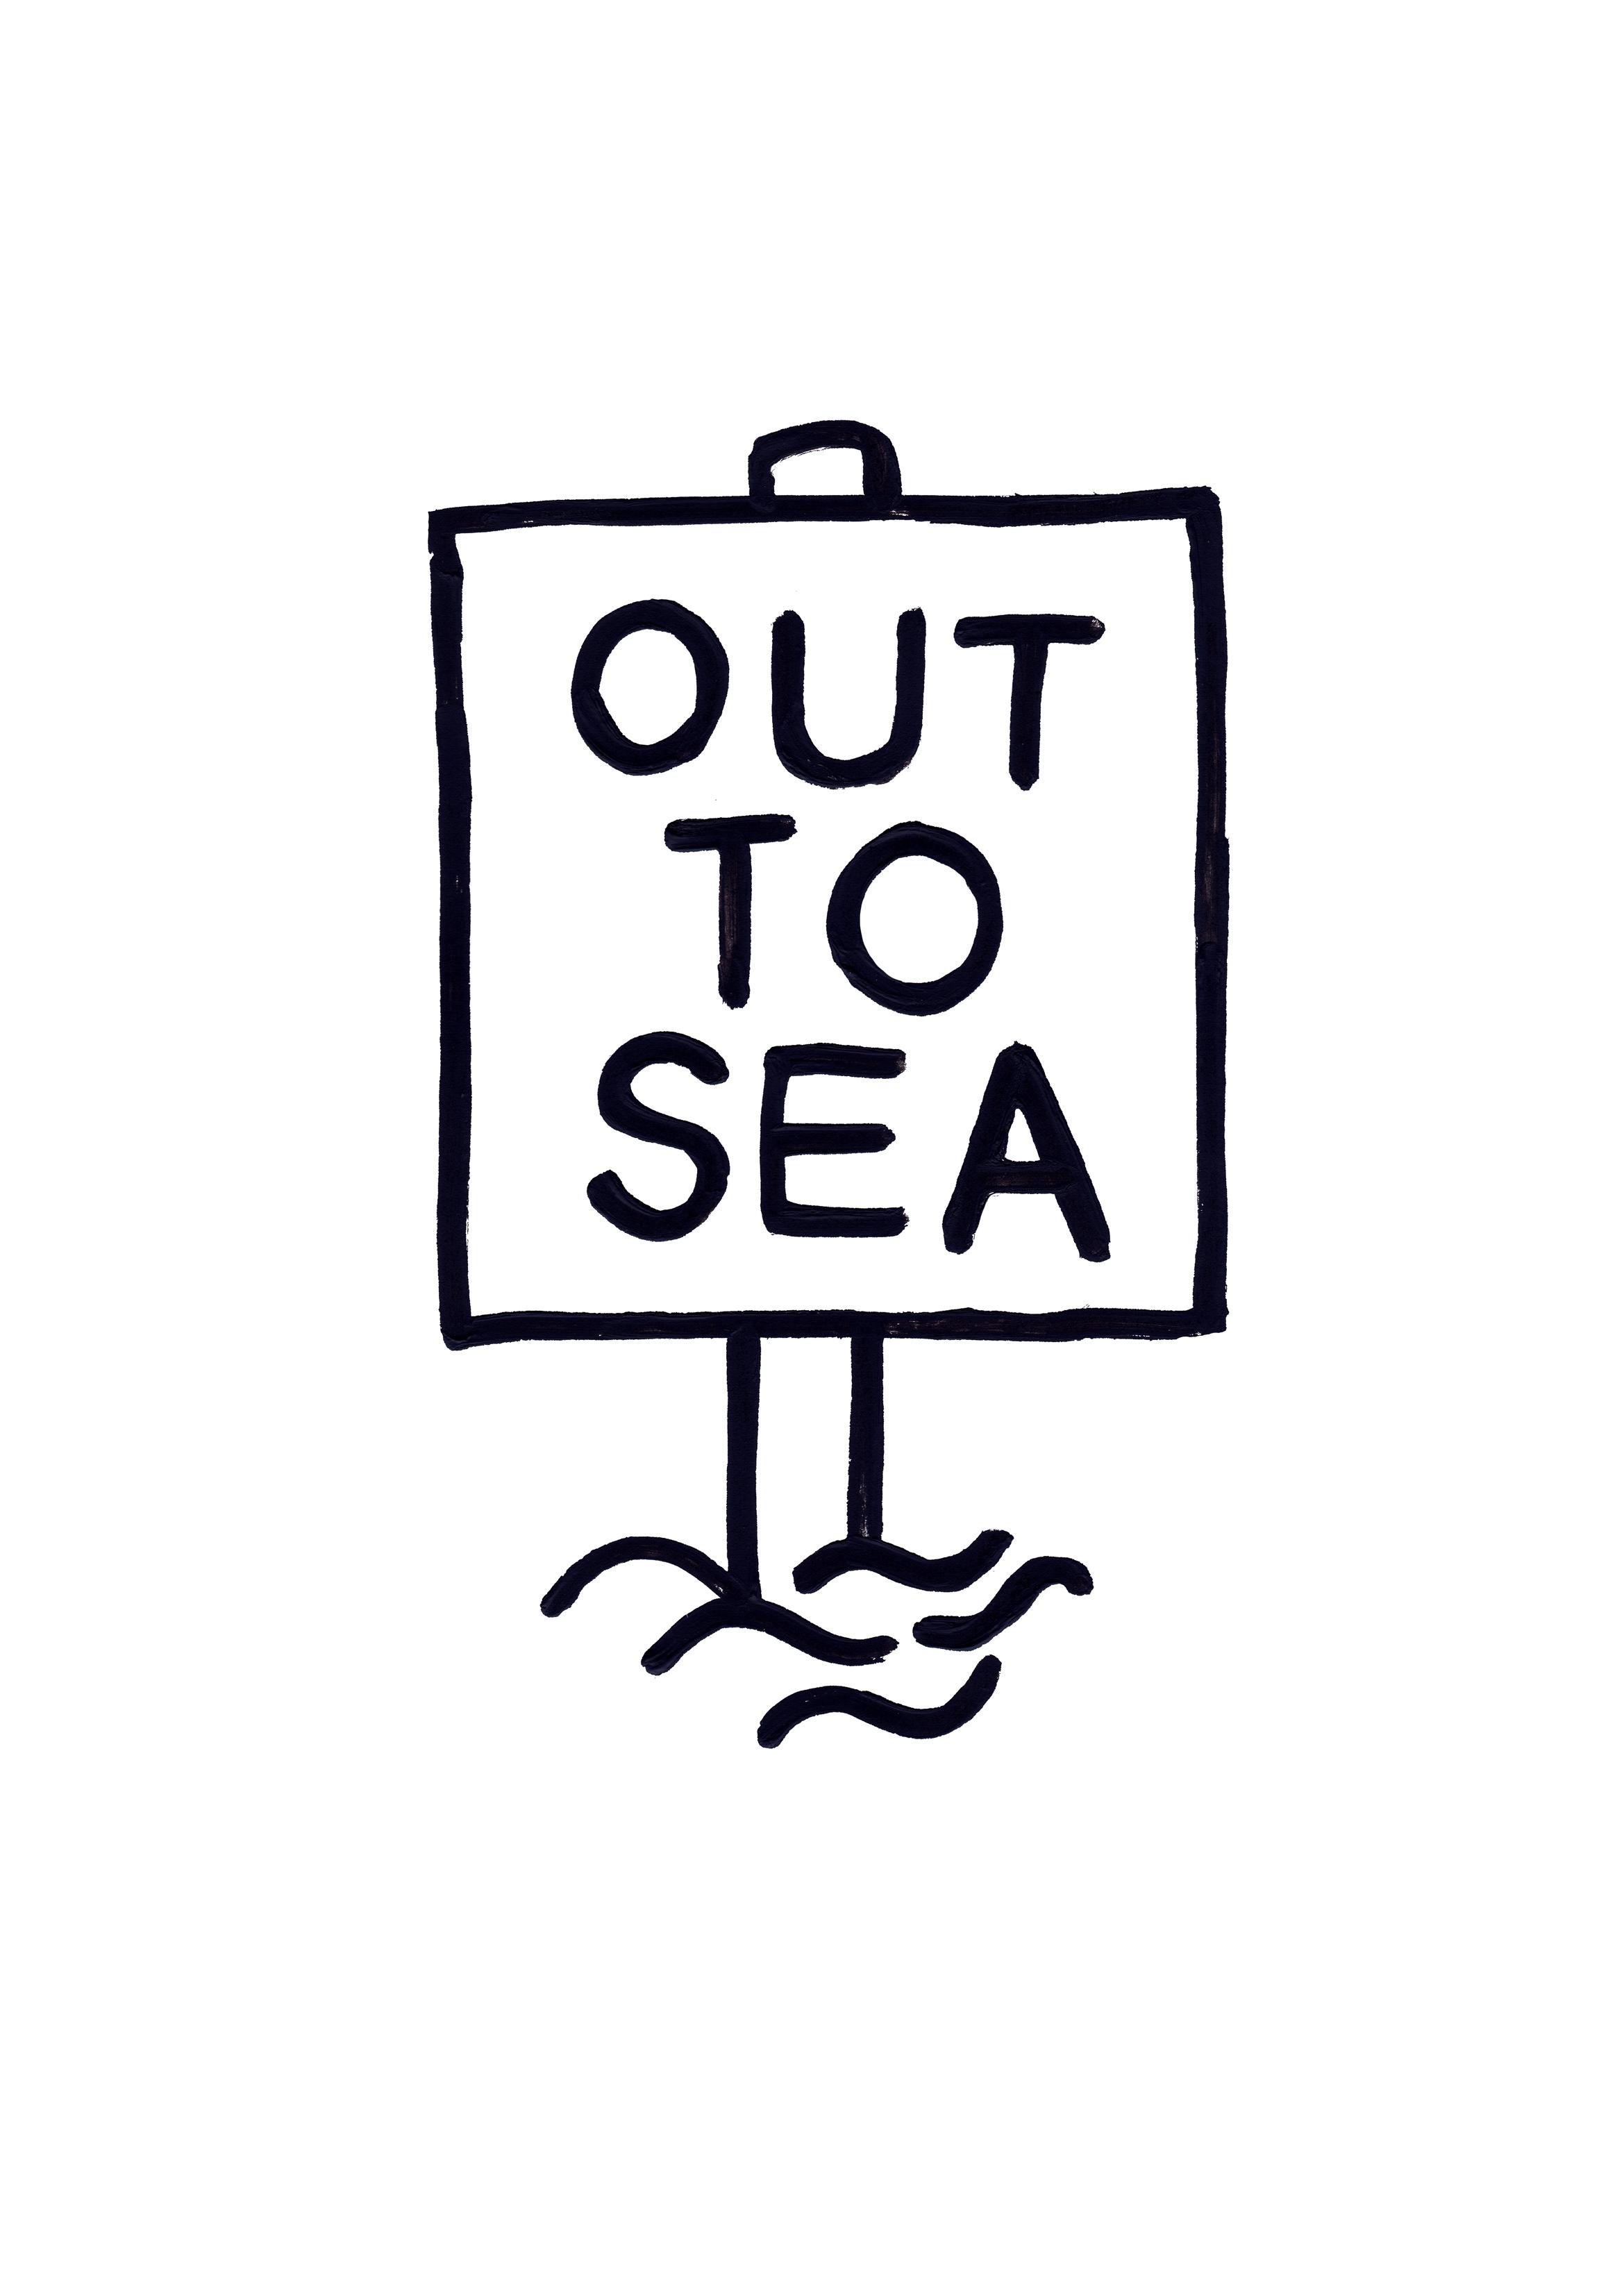 Out to Sea , Adam Bridgland, A3 monoprint, 2017.